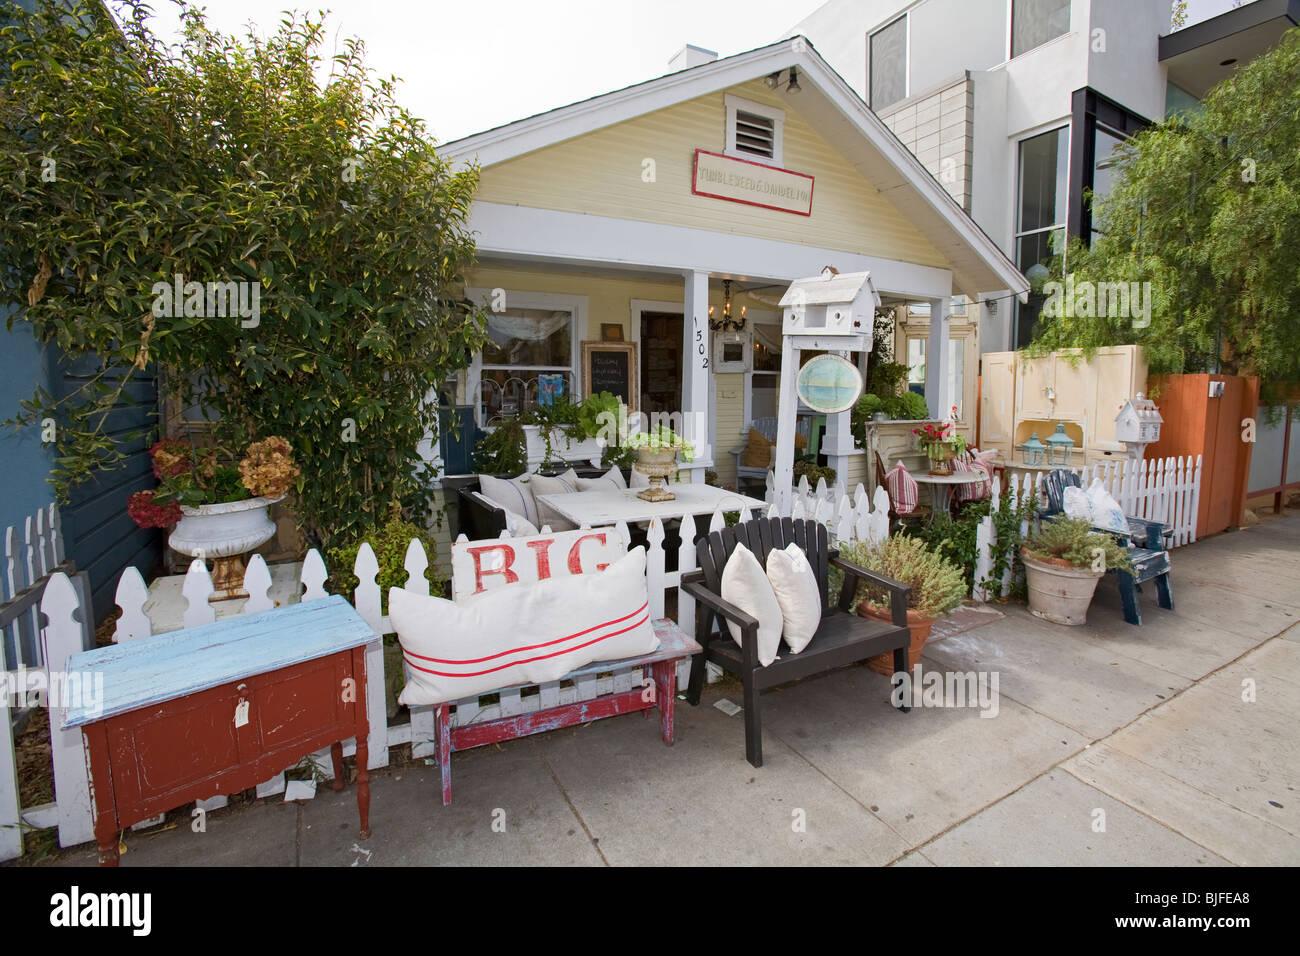 Abbot Kinney Blvd Venice Beach Los Angeles California USA